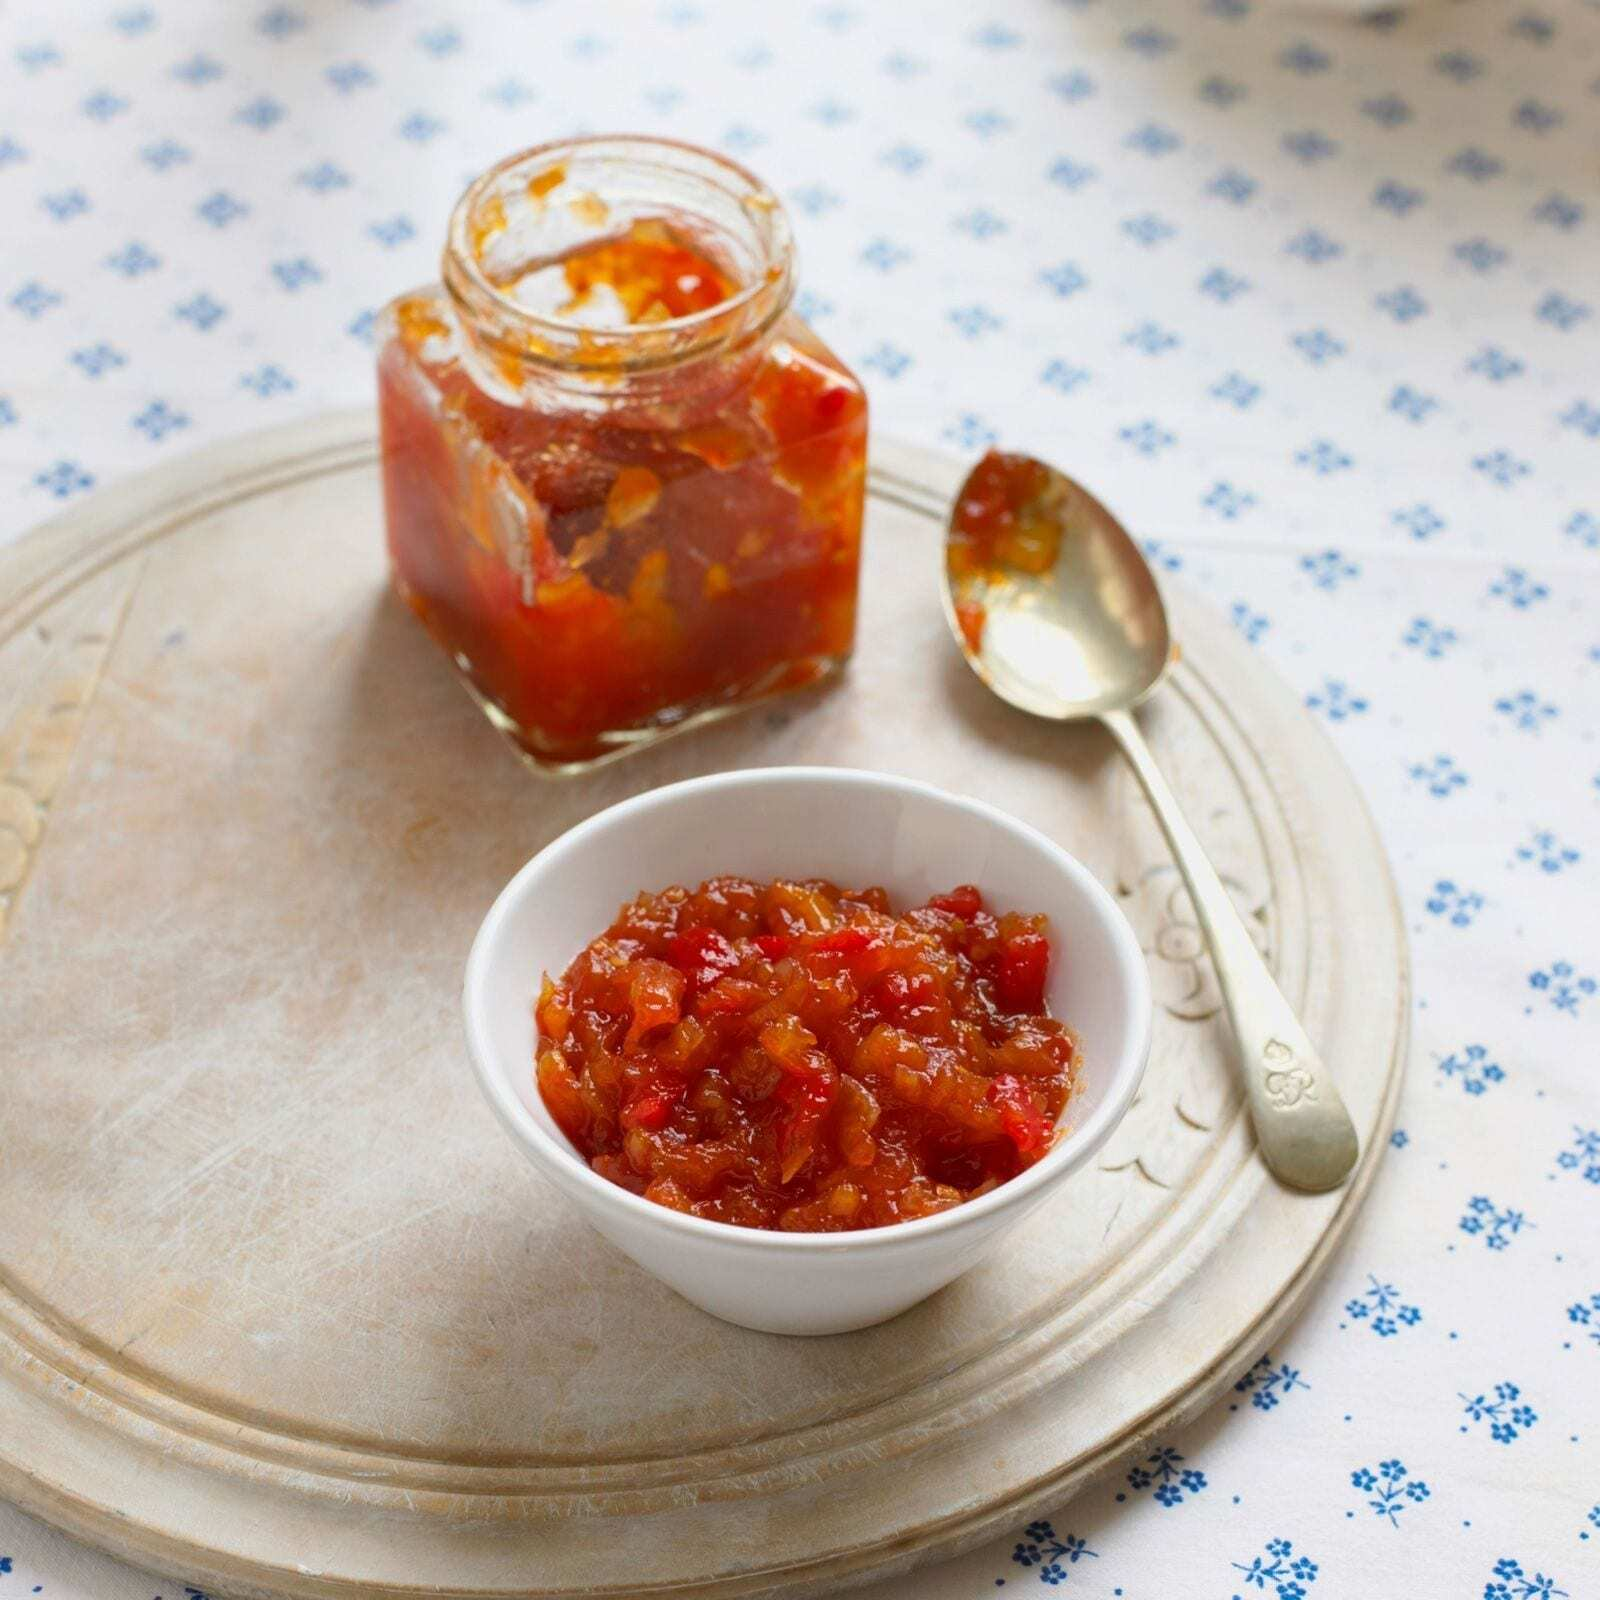 Kürbis-Tomaten-Chutney-von-Rosinenkind-